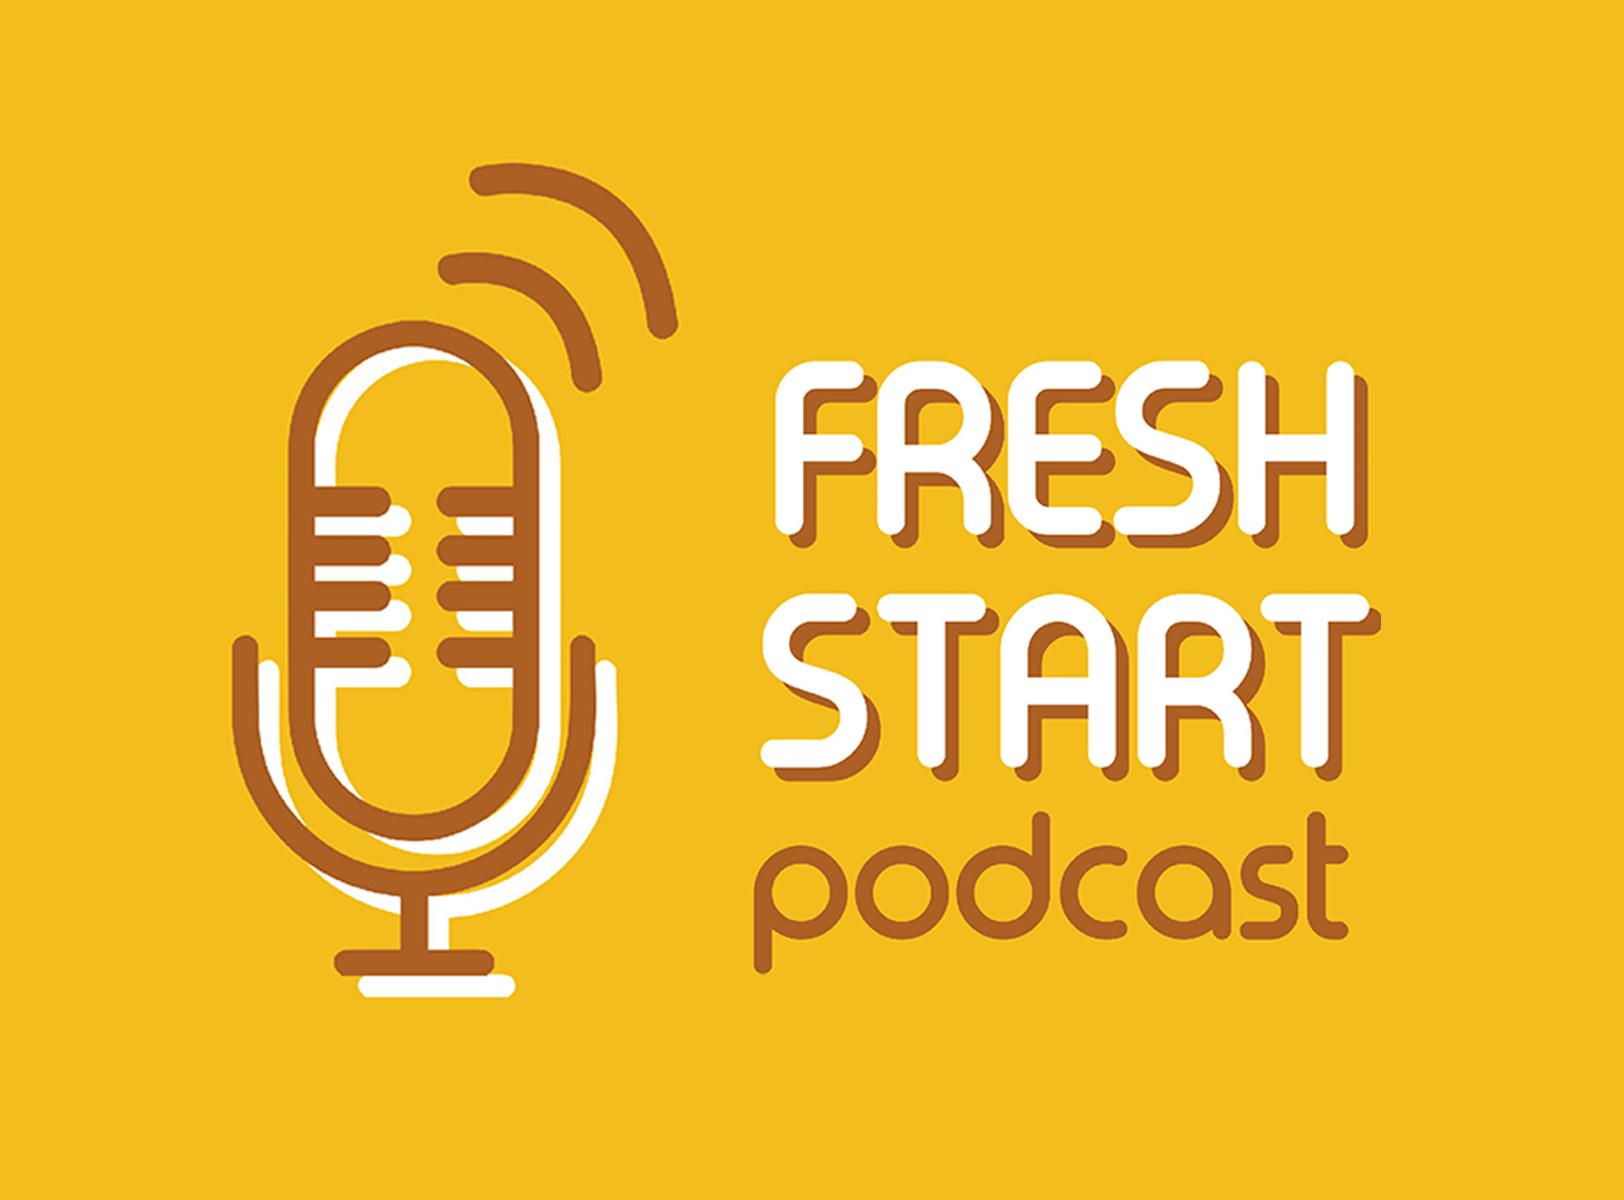 Fresh Start: Podcast News (9/23/2019 Mon.)